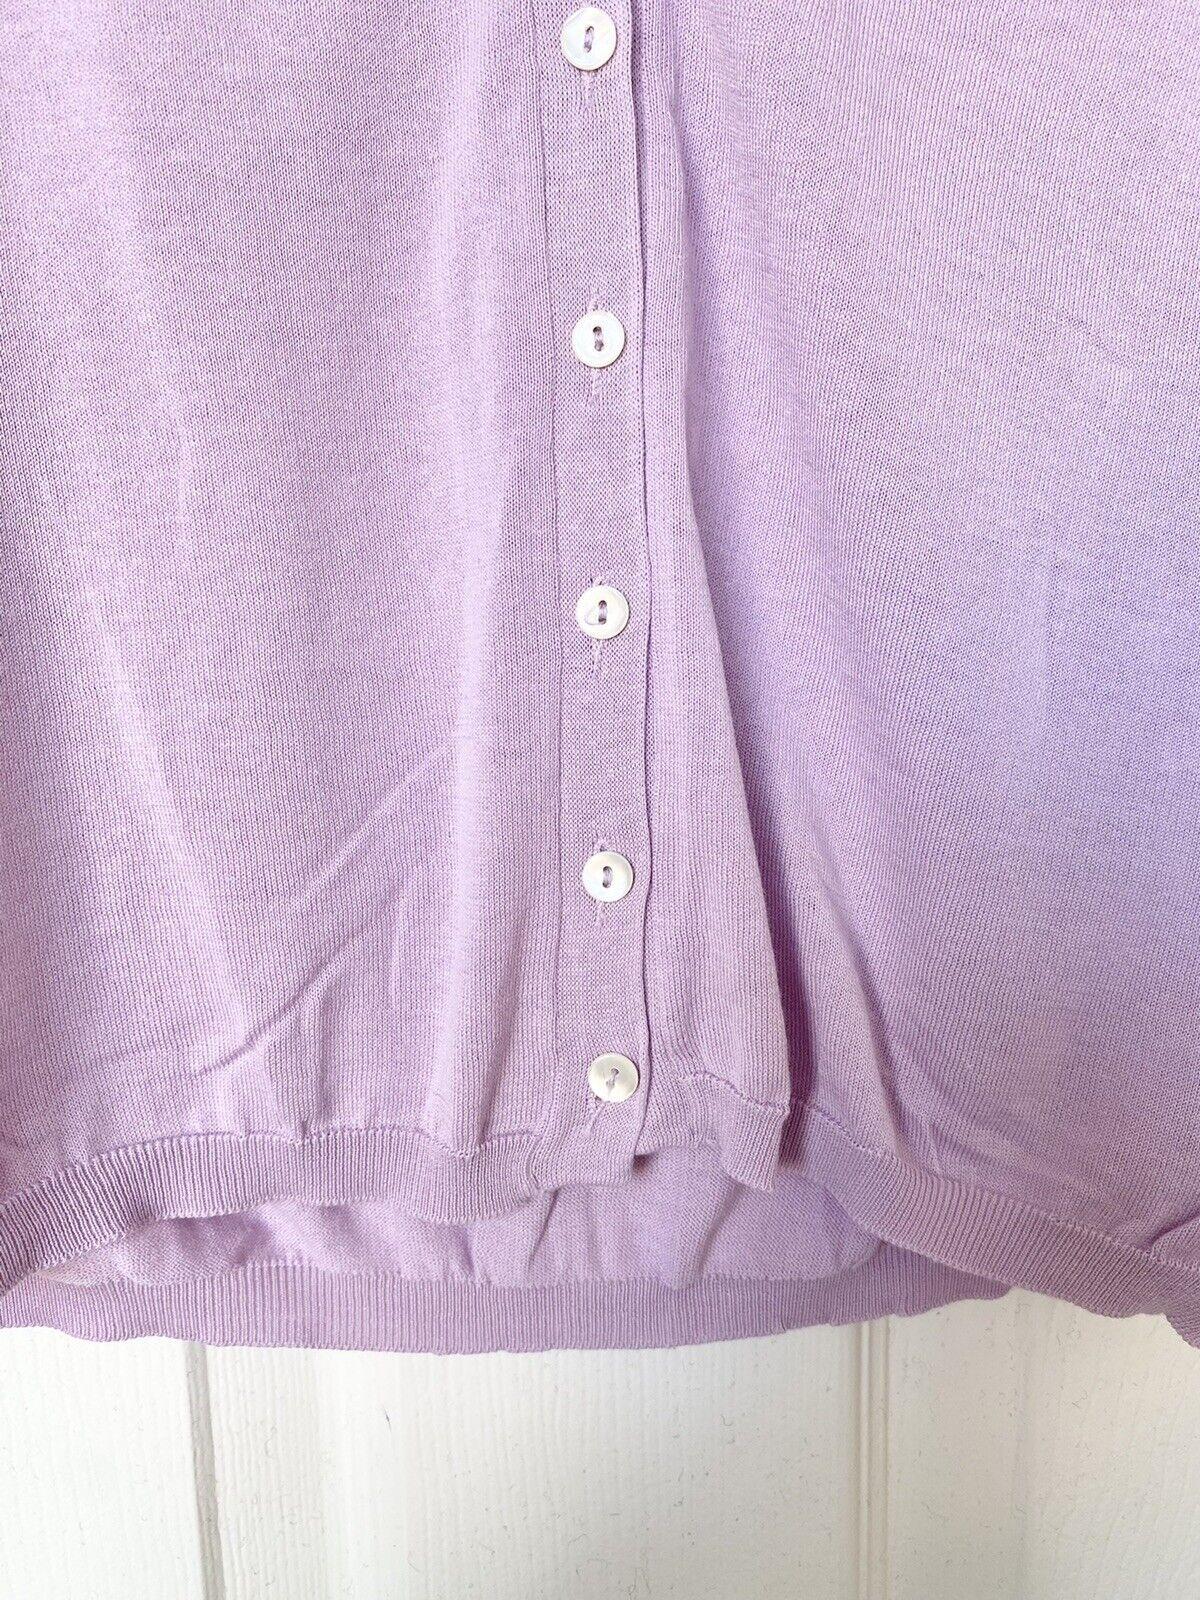 Malo Lilac Lightweight Cardigan Size 42 IT / US 6 - image 2